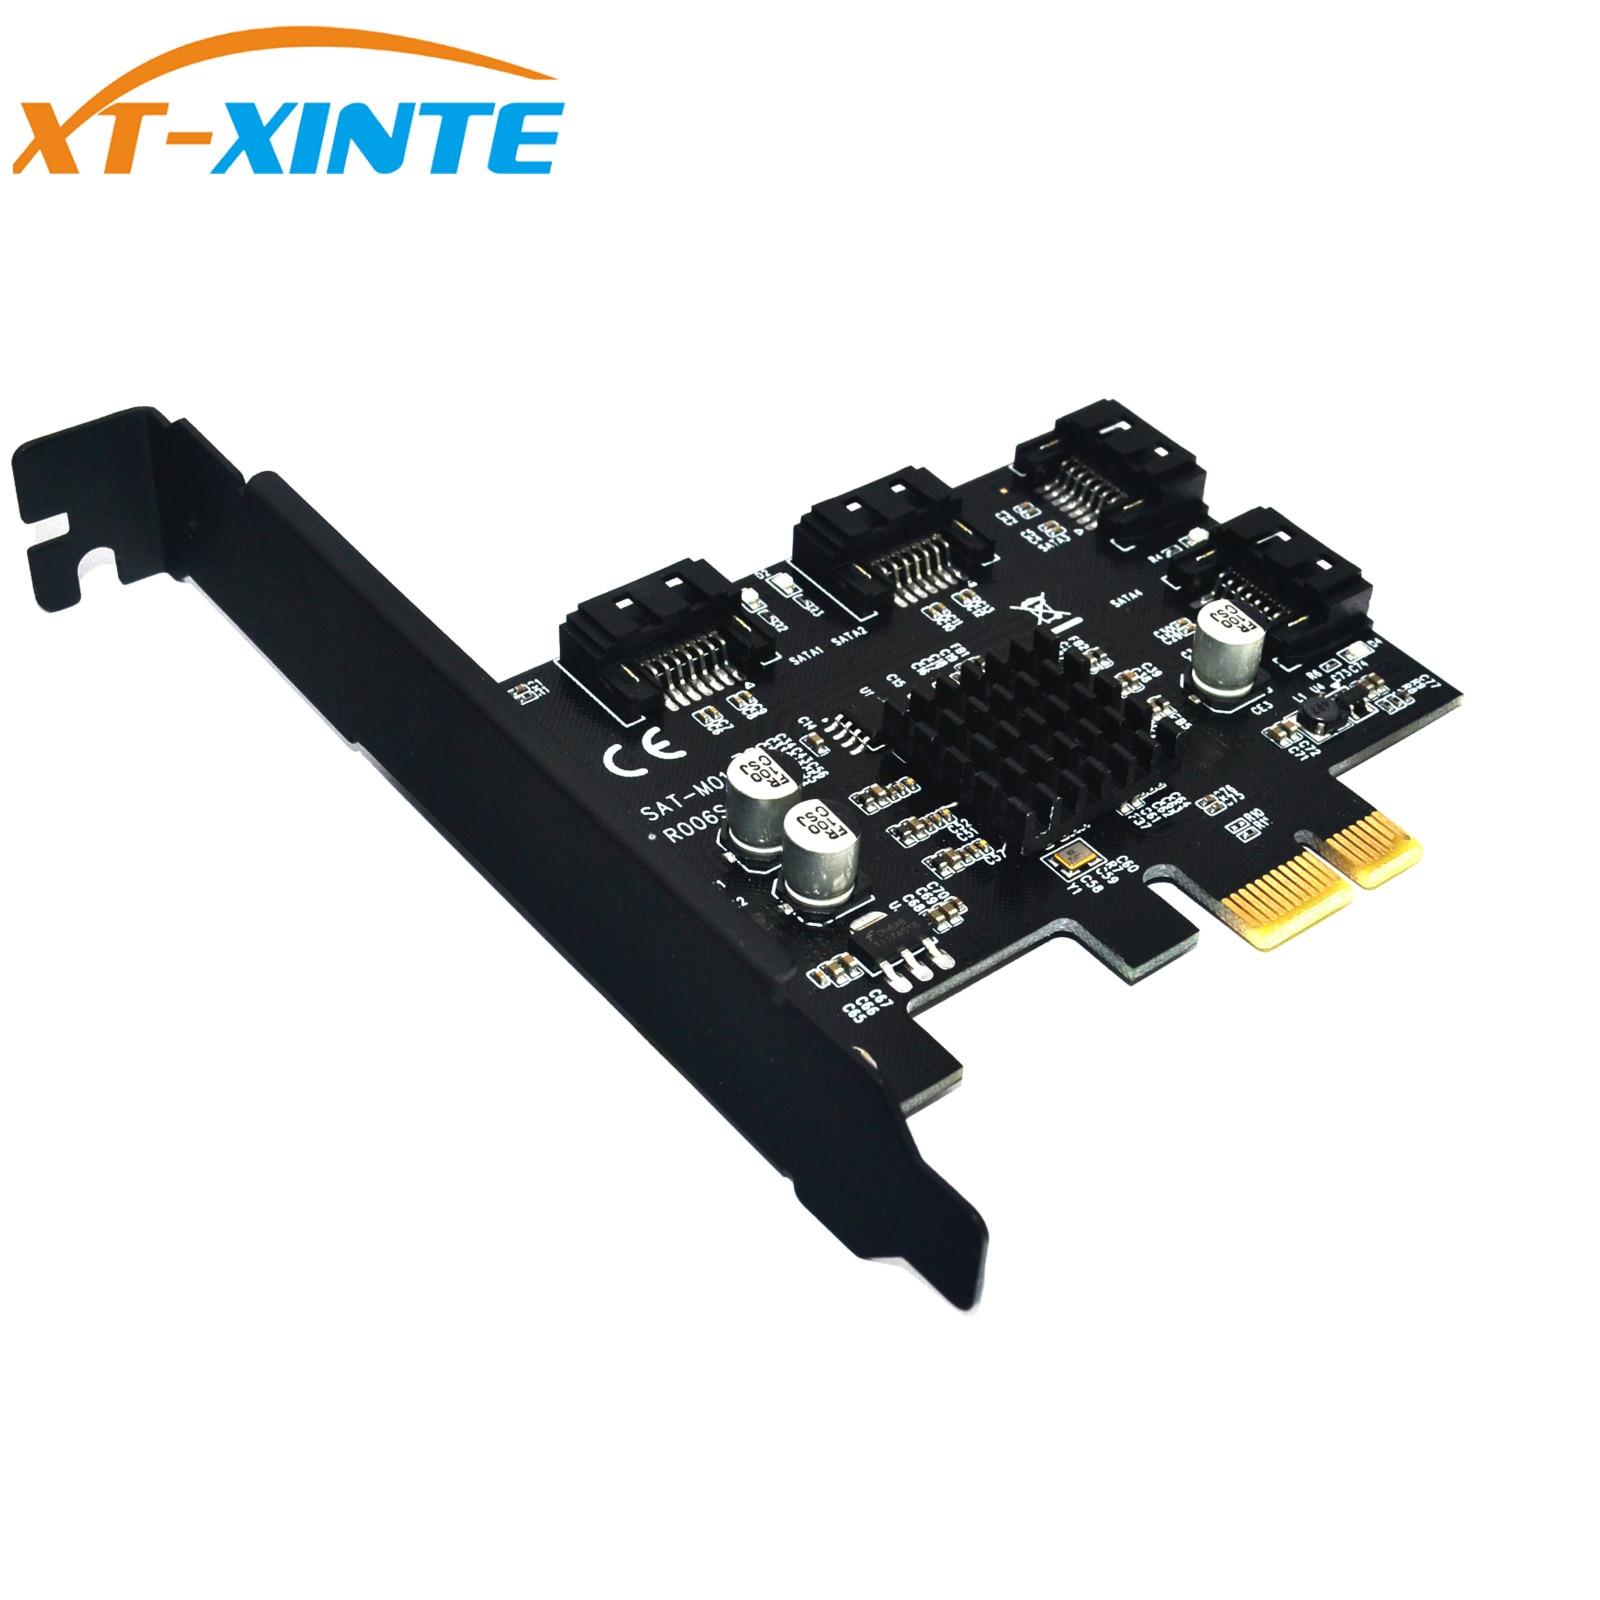 88SE9215 4 Ports SATA 6G PCI Express Controller Card PCI-e To SATA III 3.0 Converter Support Low Profile Bracket SATA3.0 цена и фото